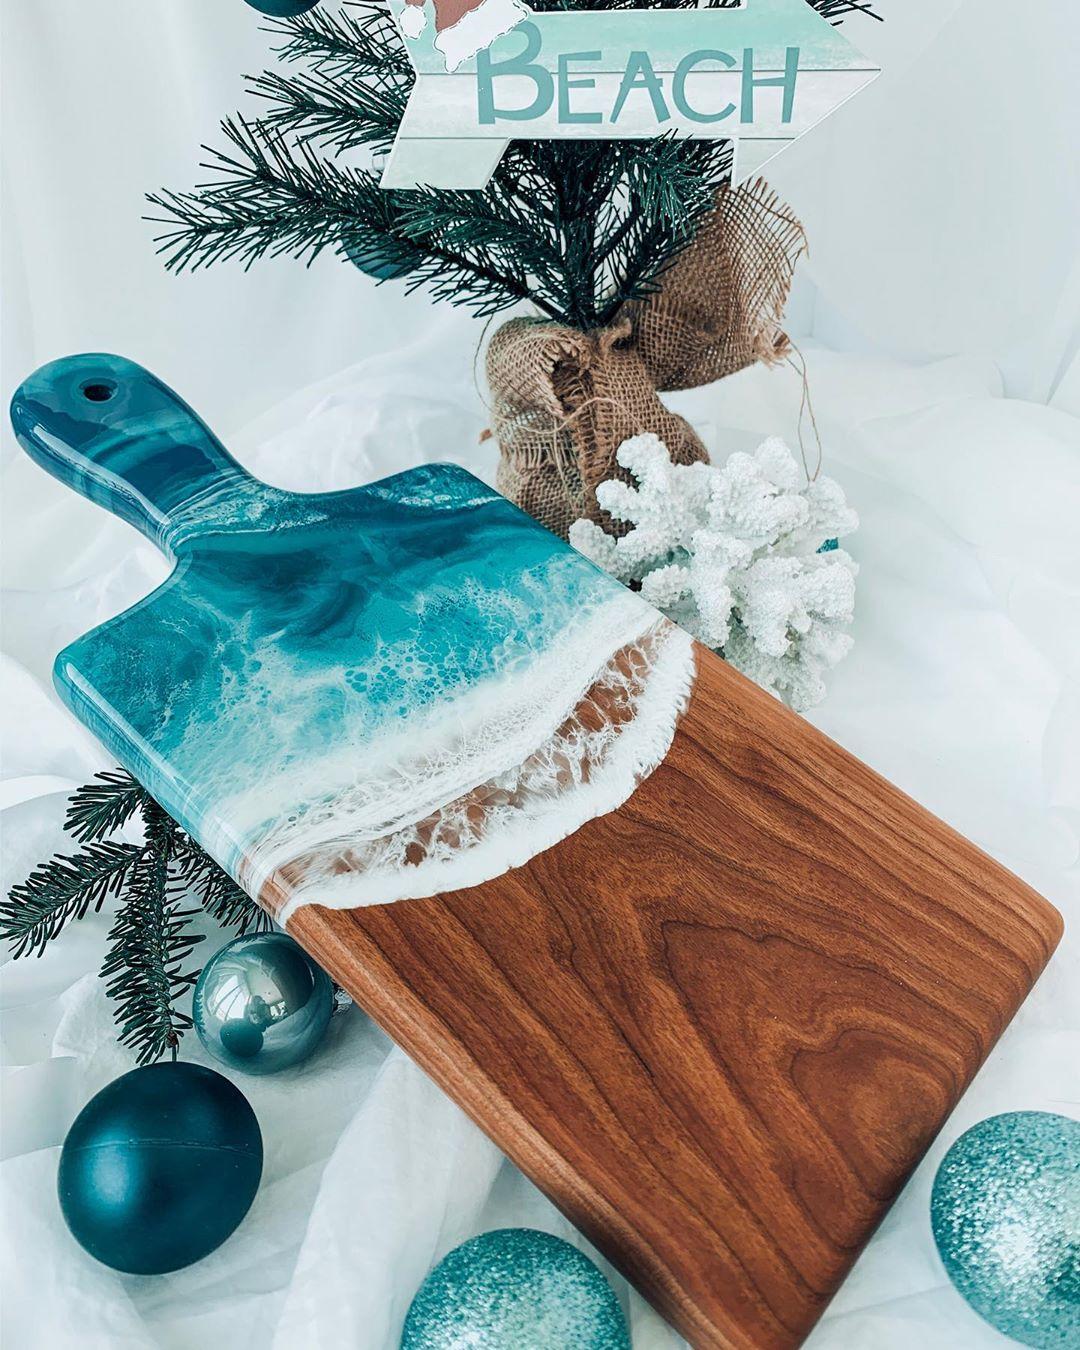 Coastal Christmas Decorations to Buy via Backwood Design